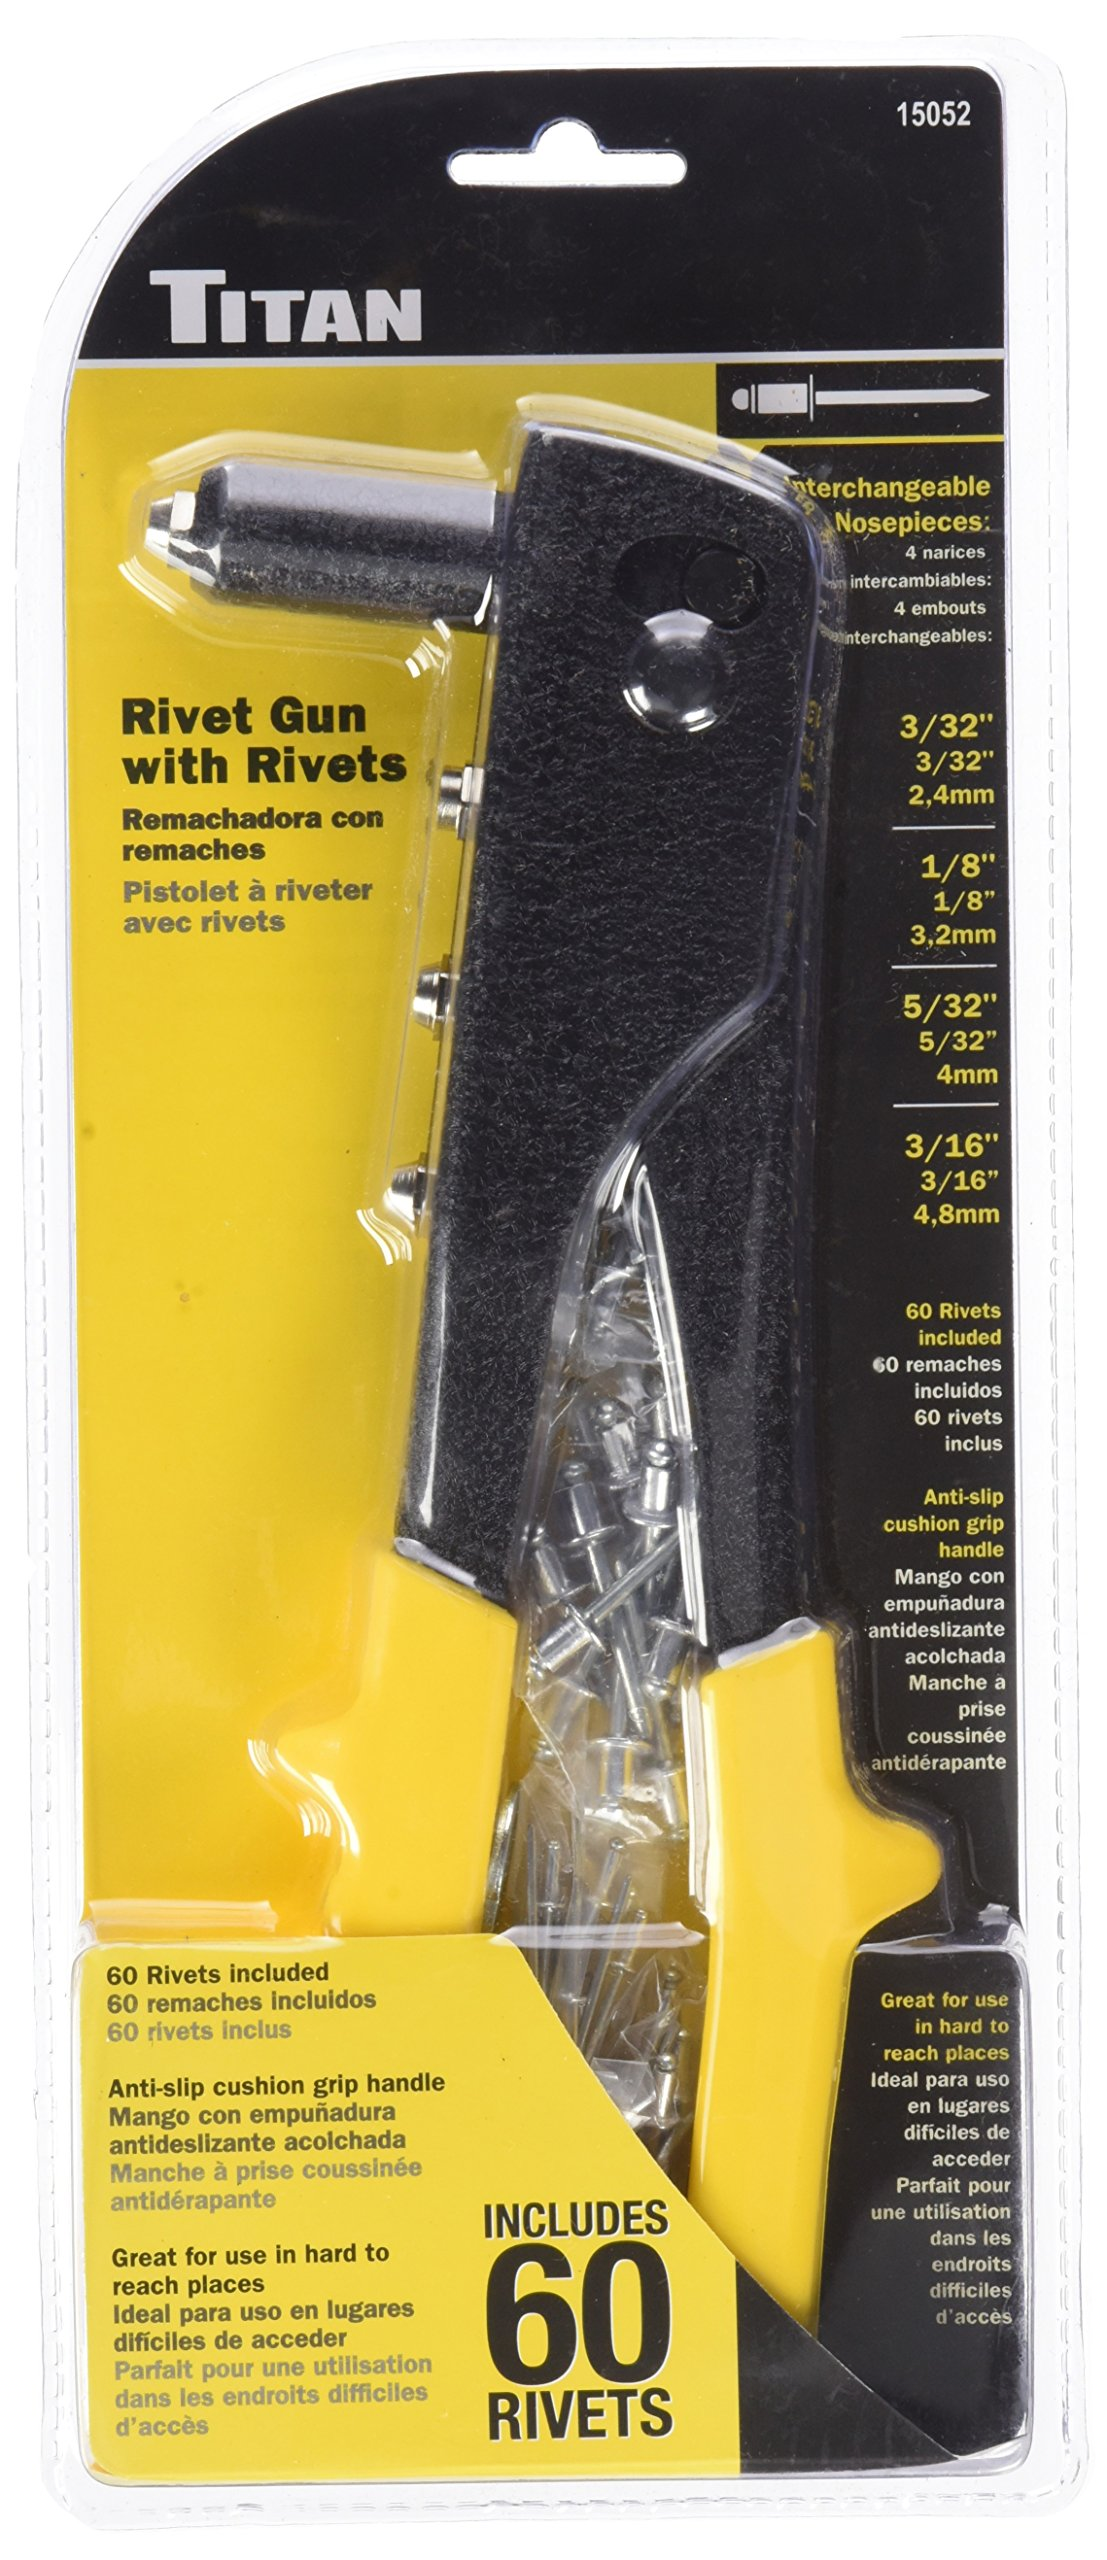 Titan TIT15052 10'' Rivet Gun (with Rivets) by Titan (Image #1)